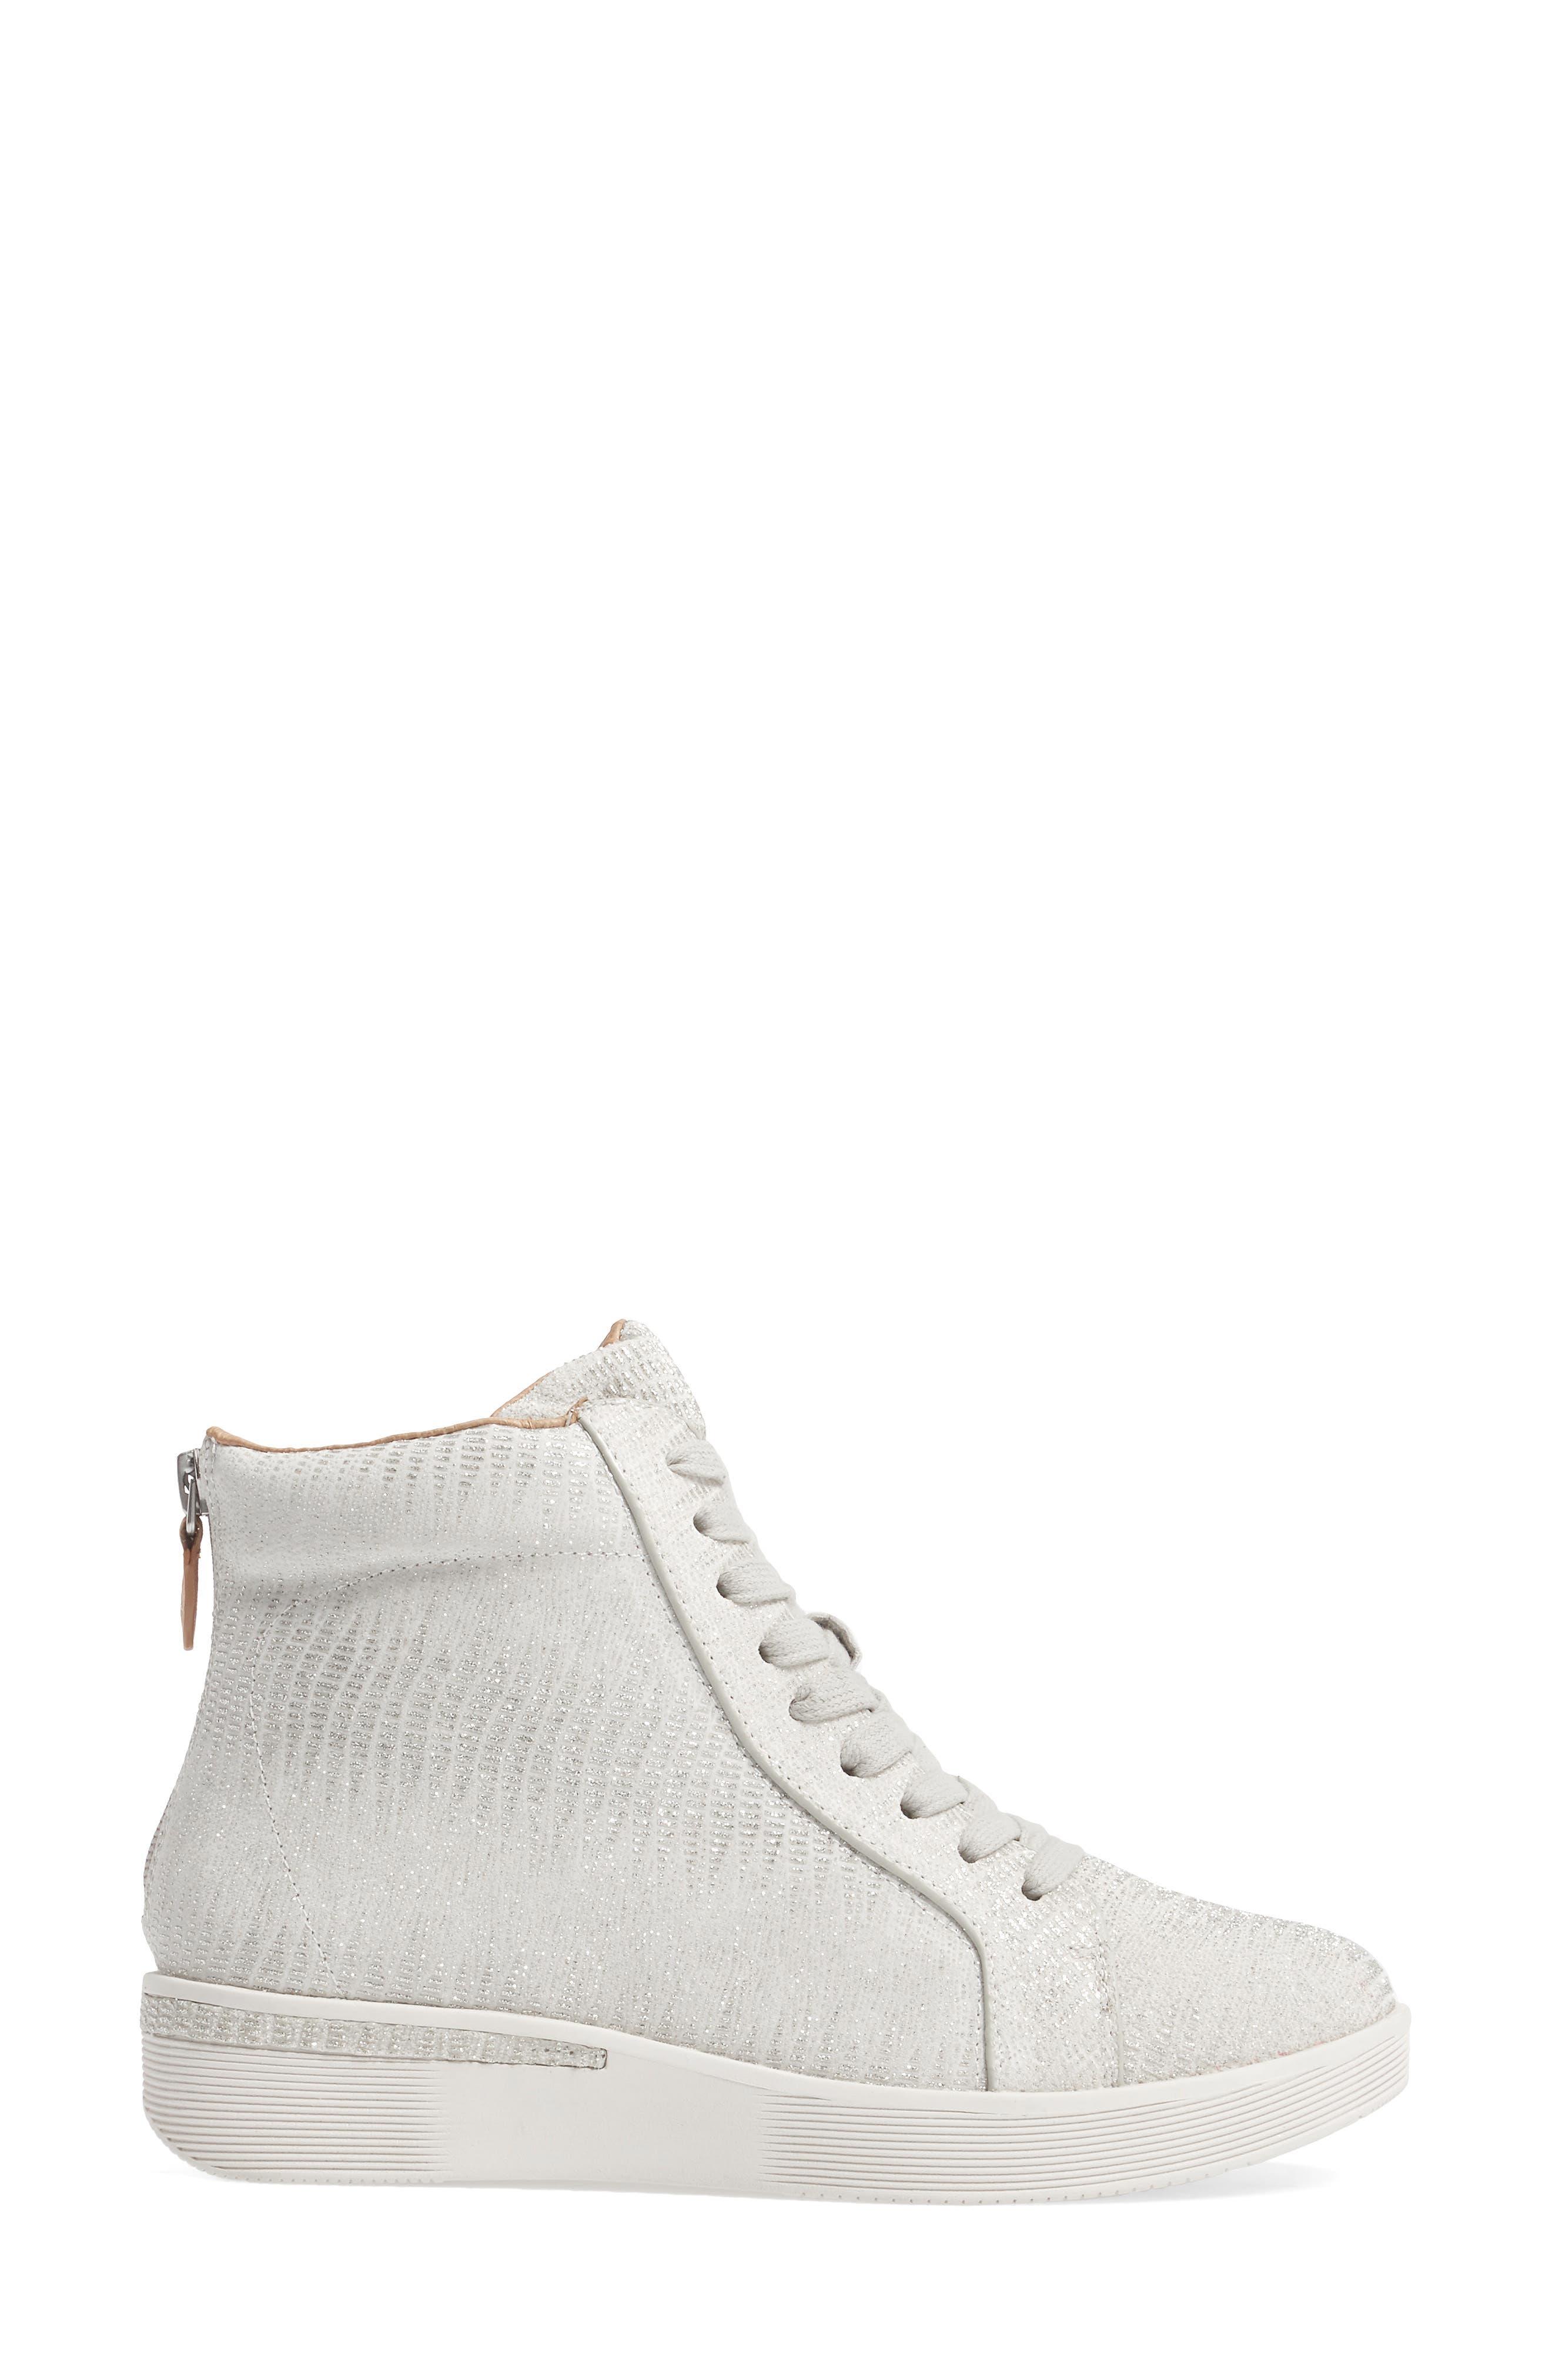 Helka High Top Sneaker,                             Alternate thumbnail 6, color,